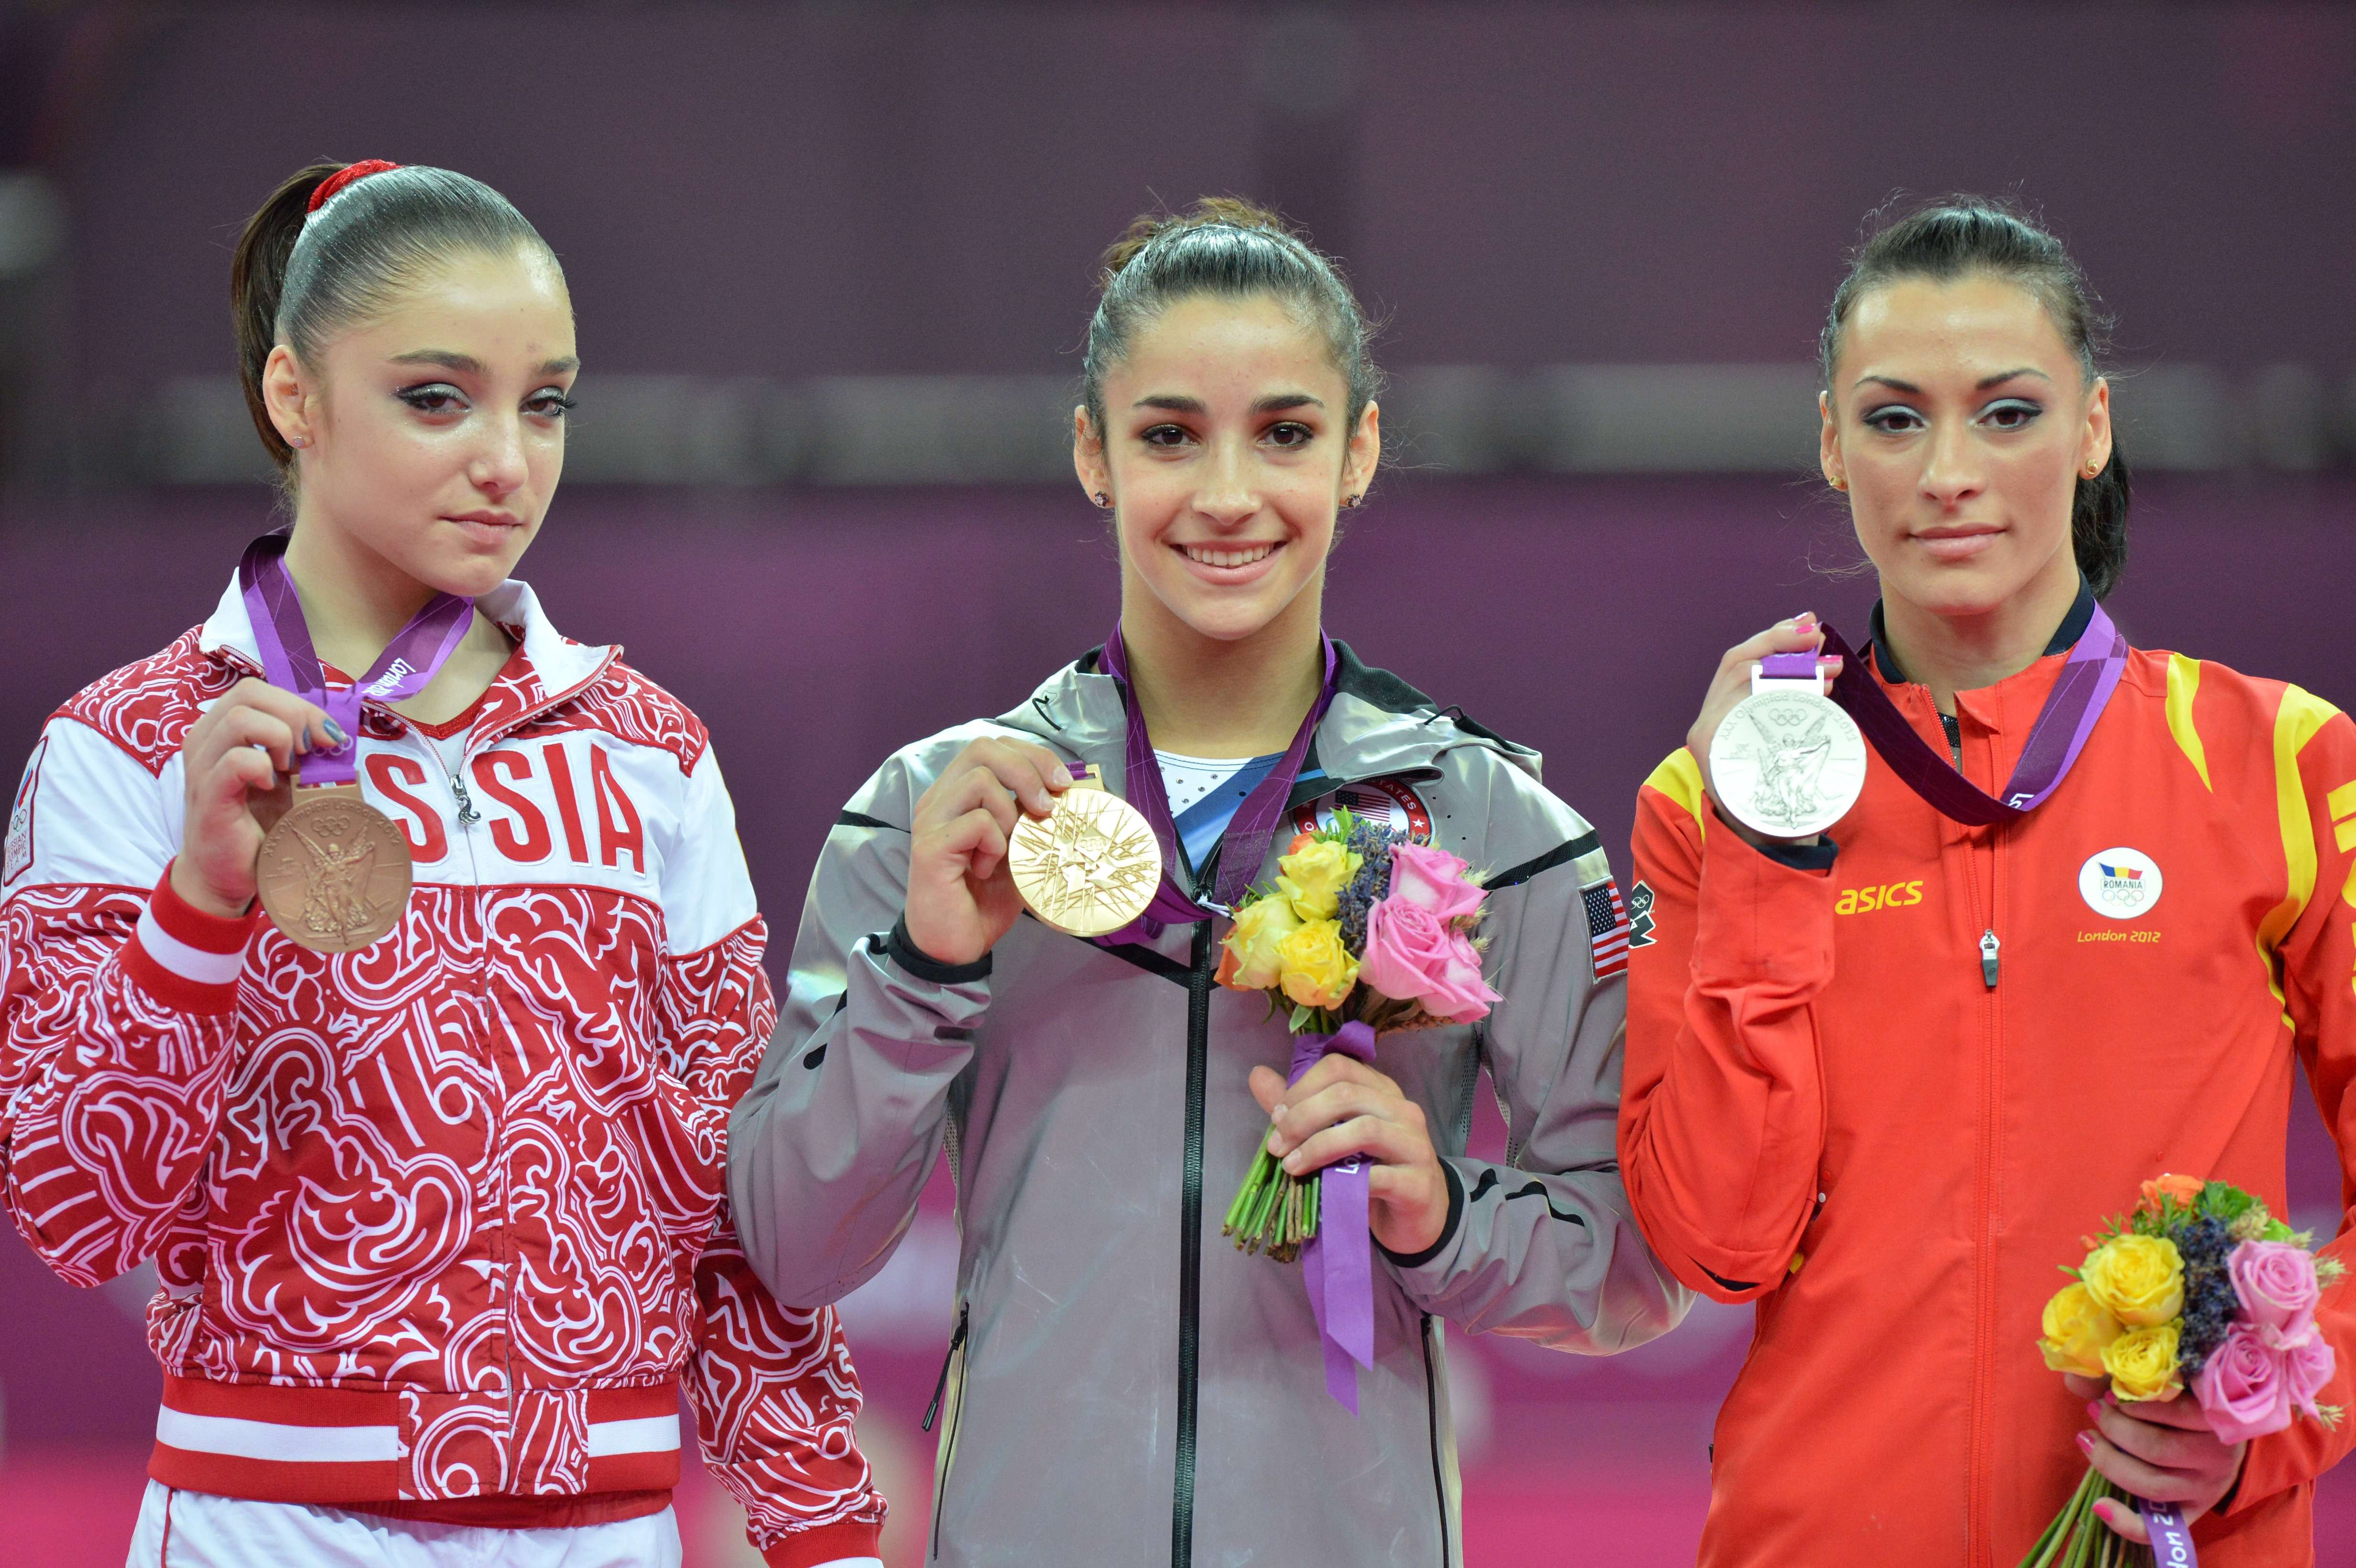 Alexandra Raisman si-a indoit medalia de aur castigata in fata Catalinei Ponor